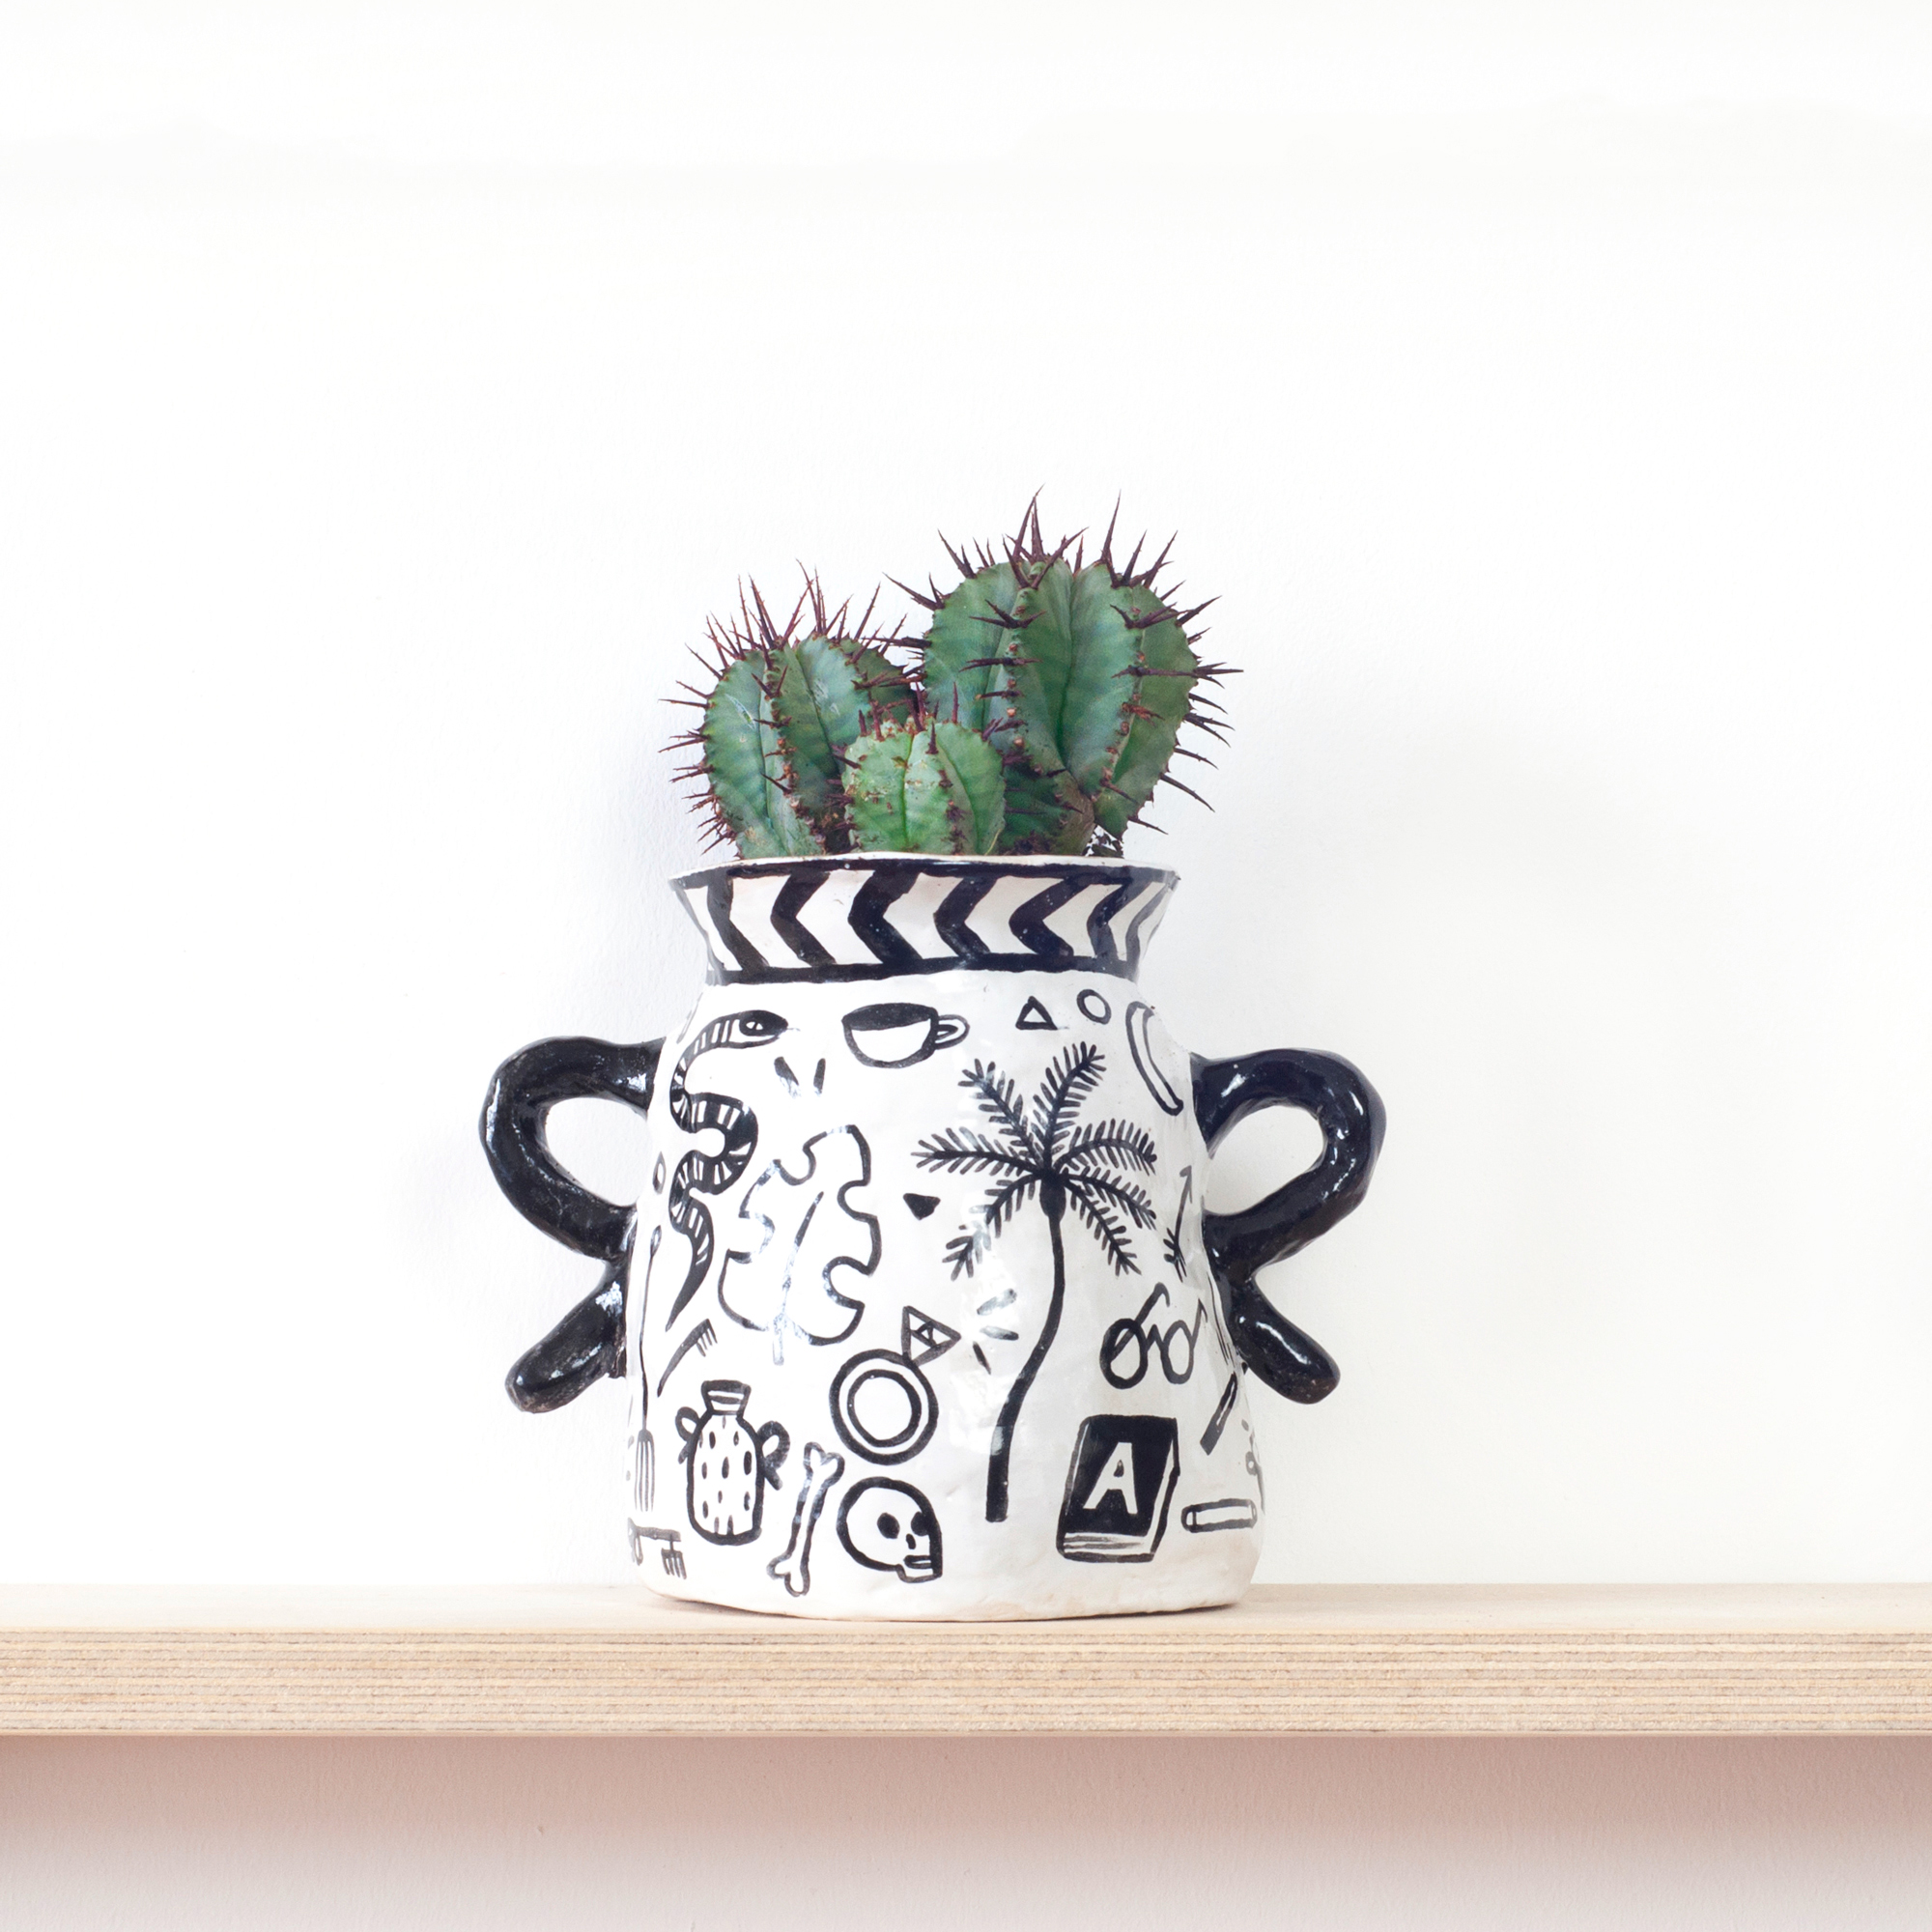 6-plantpot-rubytaylor-web.jpg